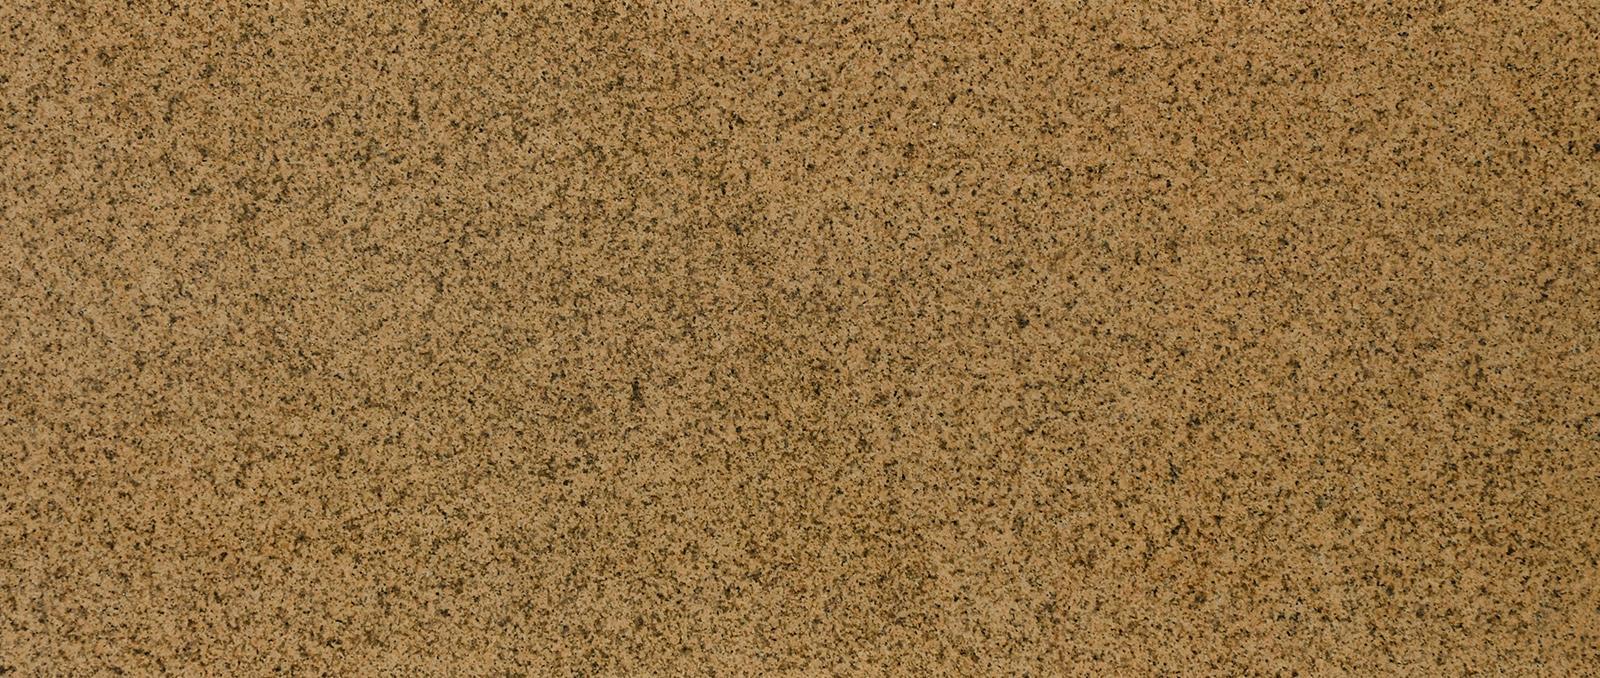 vreaupiatra-granit-aur-desert-banner